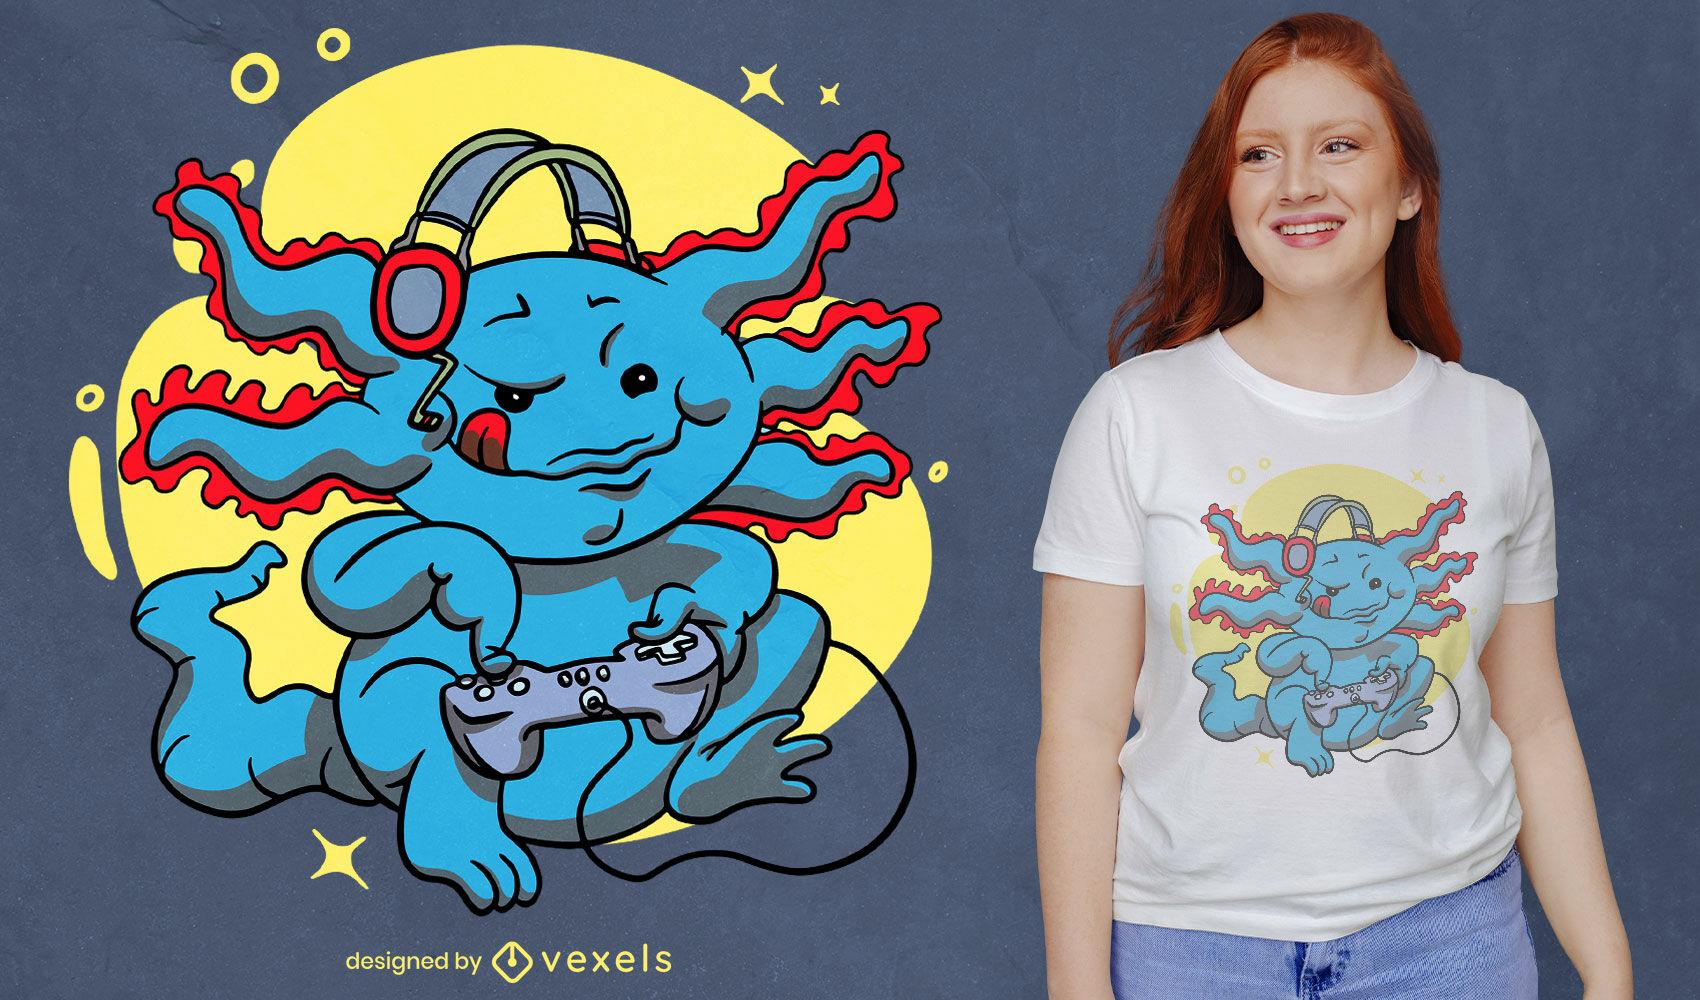 Jogador axolotl com design de t-shirt com joystick